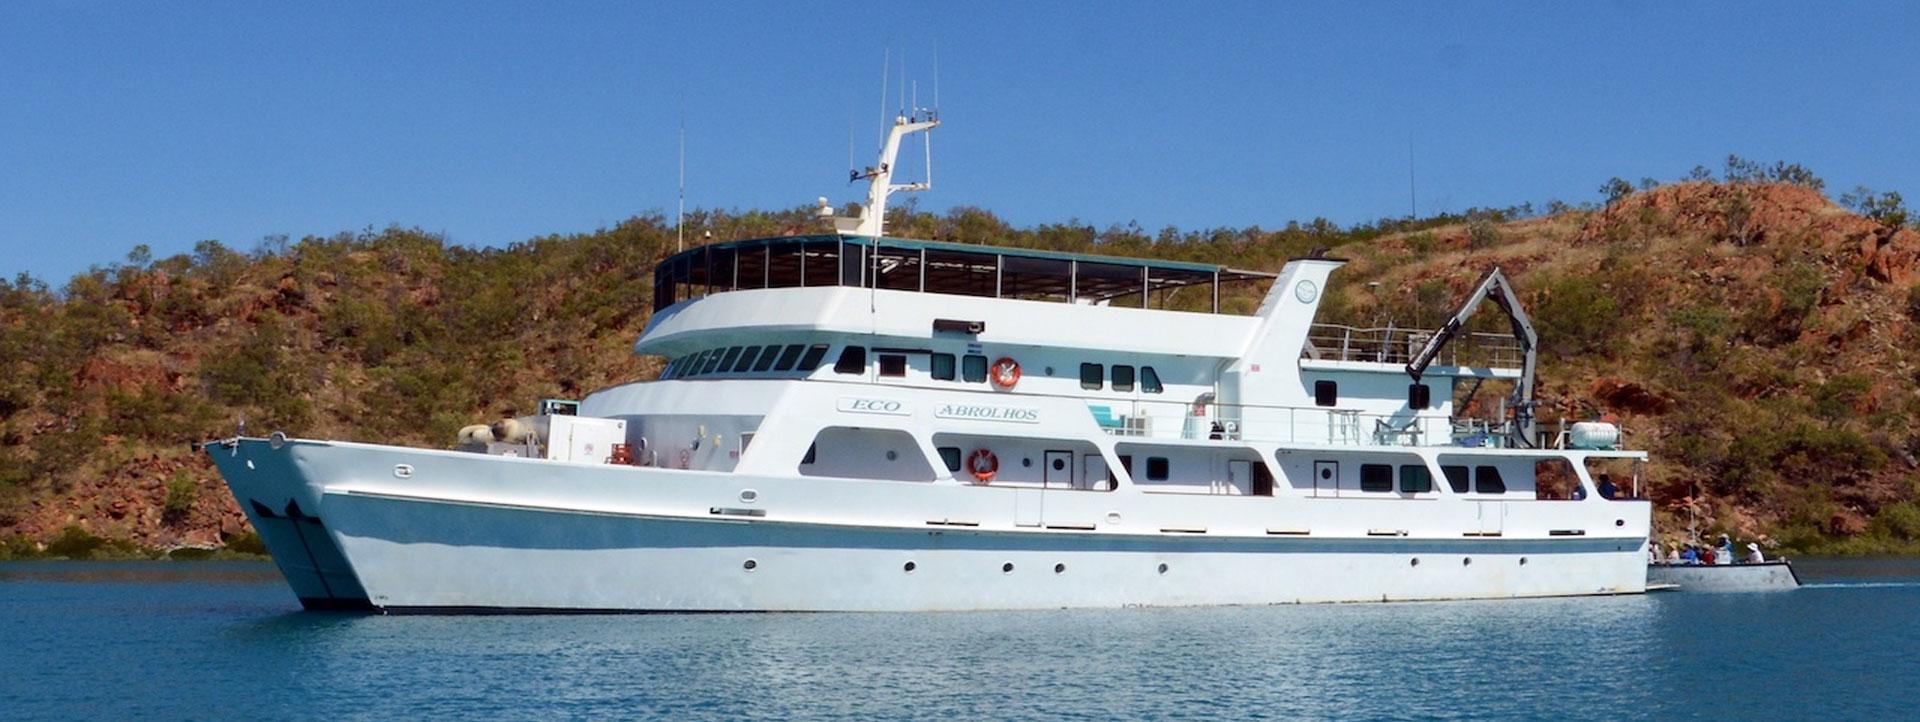 ECO-ABROLHOS-Kimberley-cruise-side-profile-image